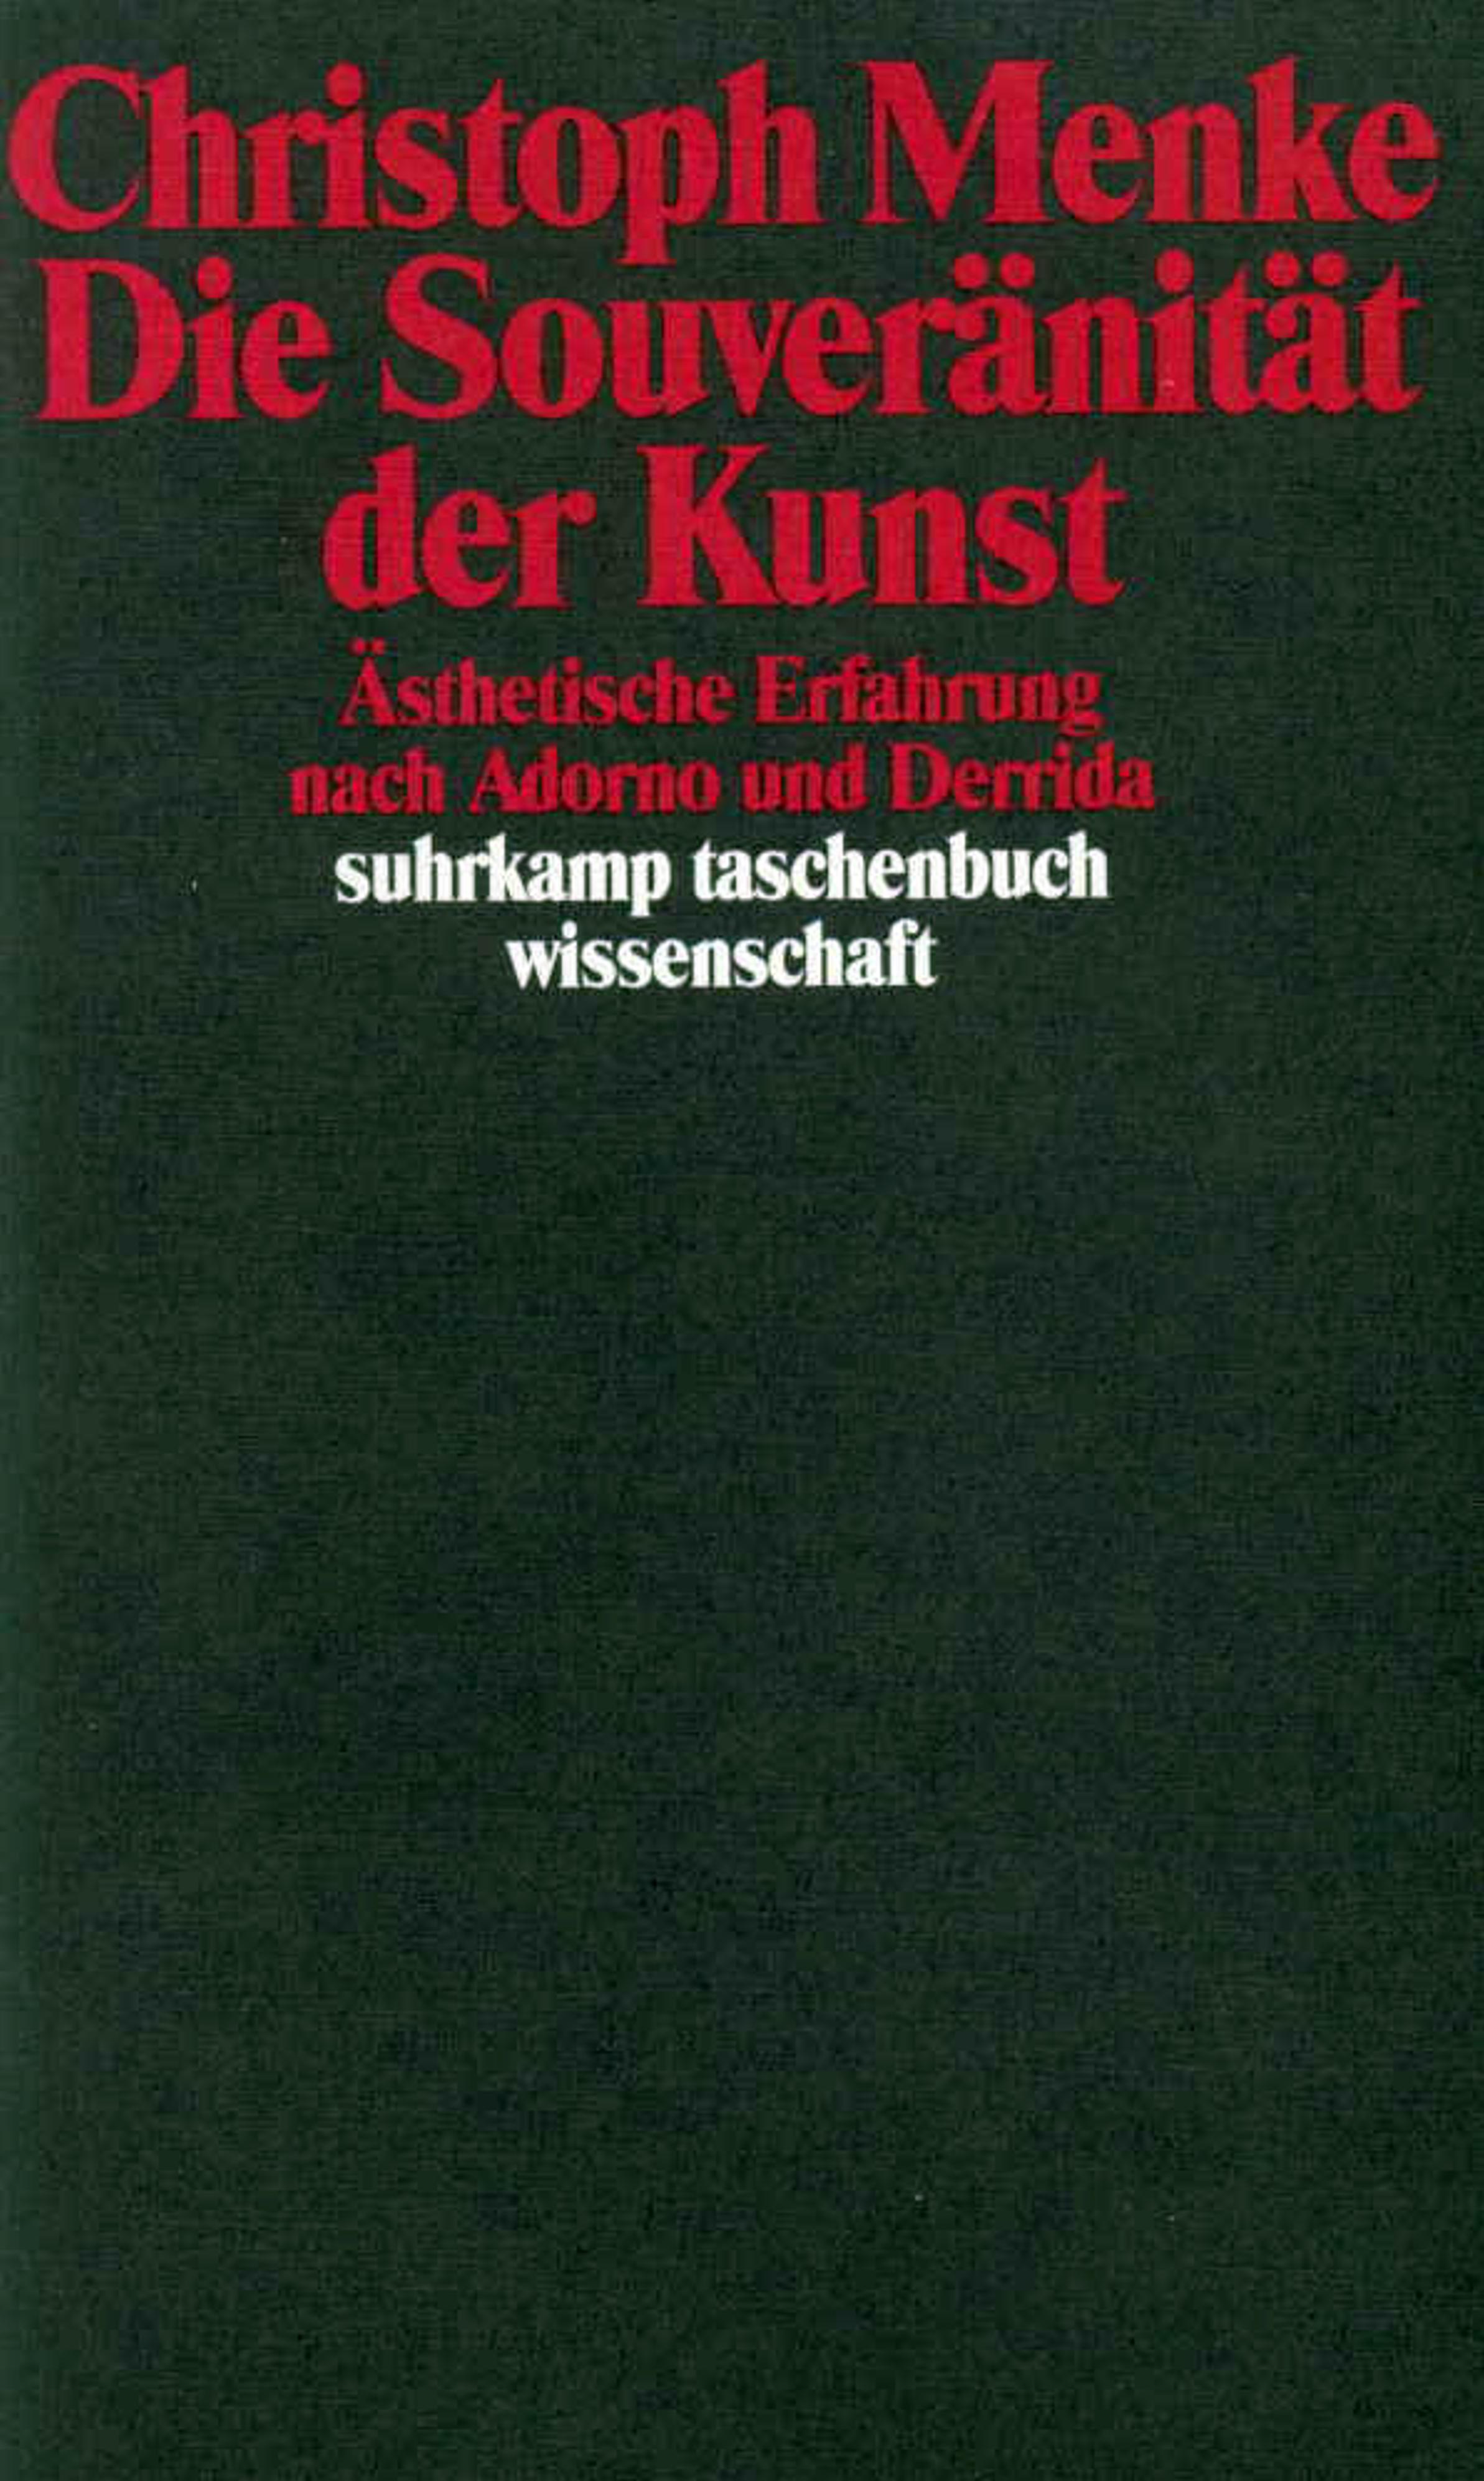 Die Souveränität der Kunst Christoph Menke